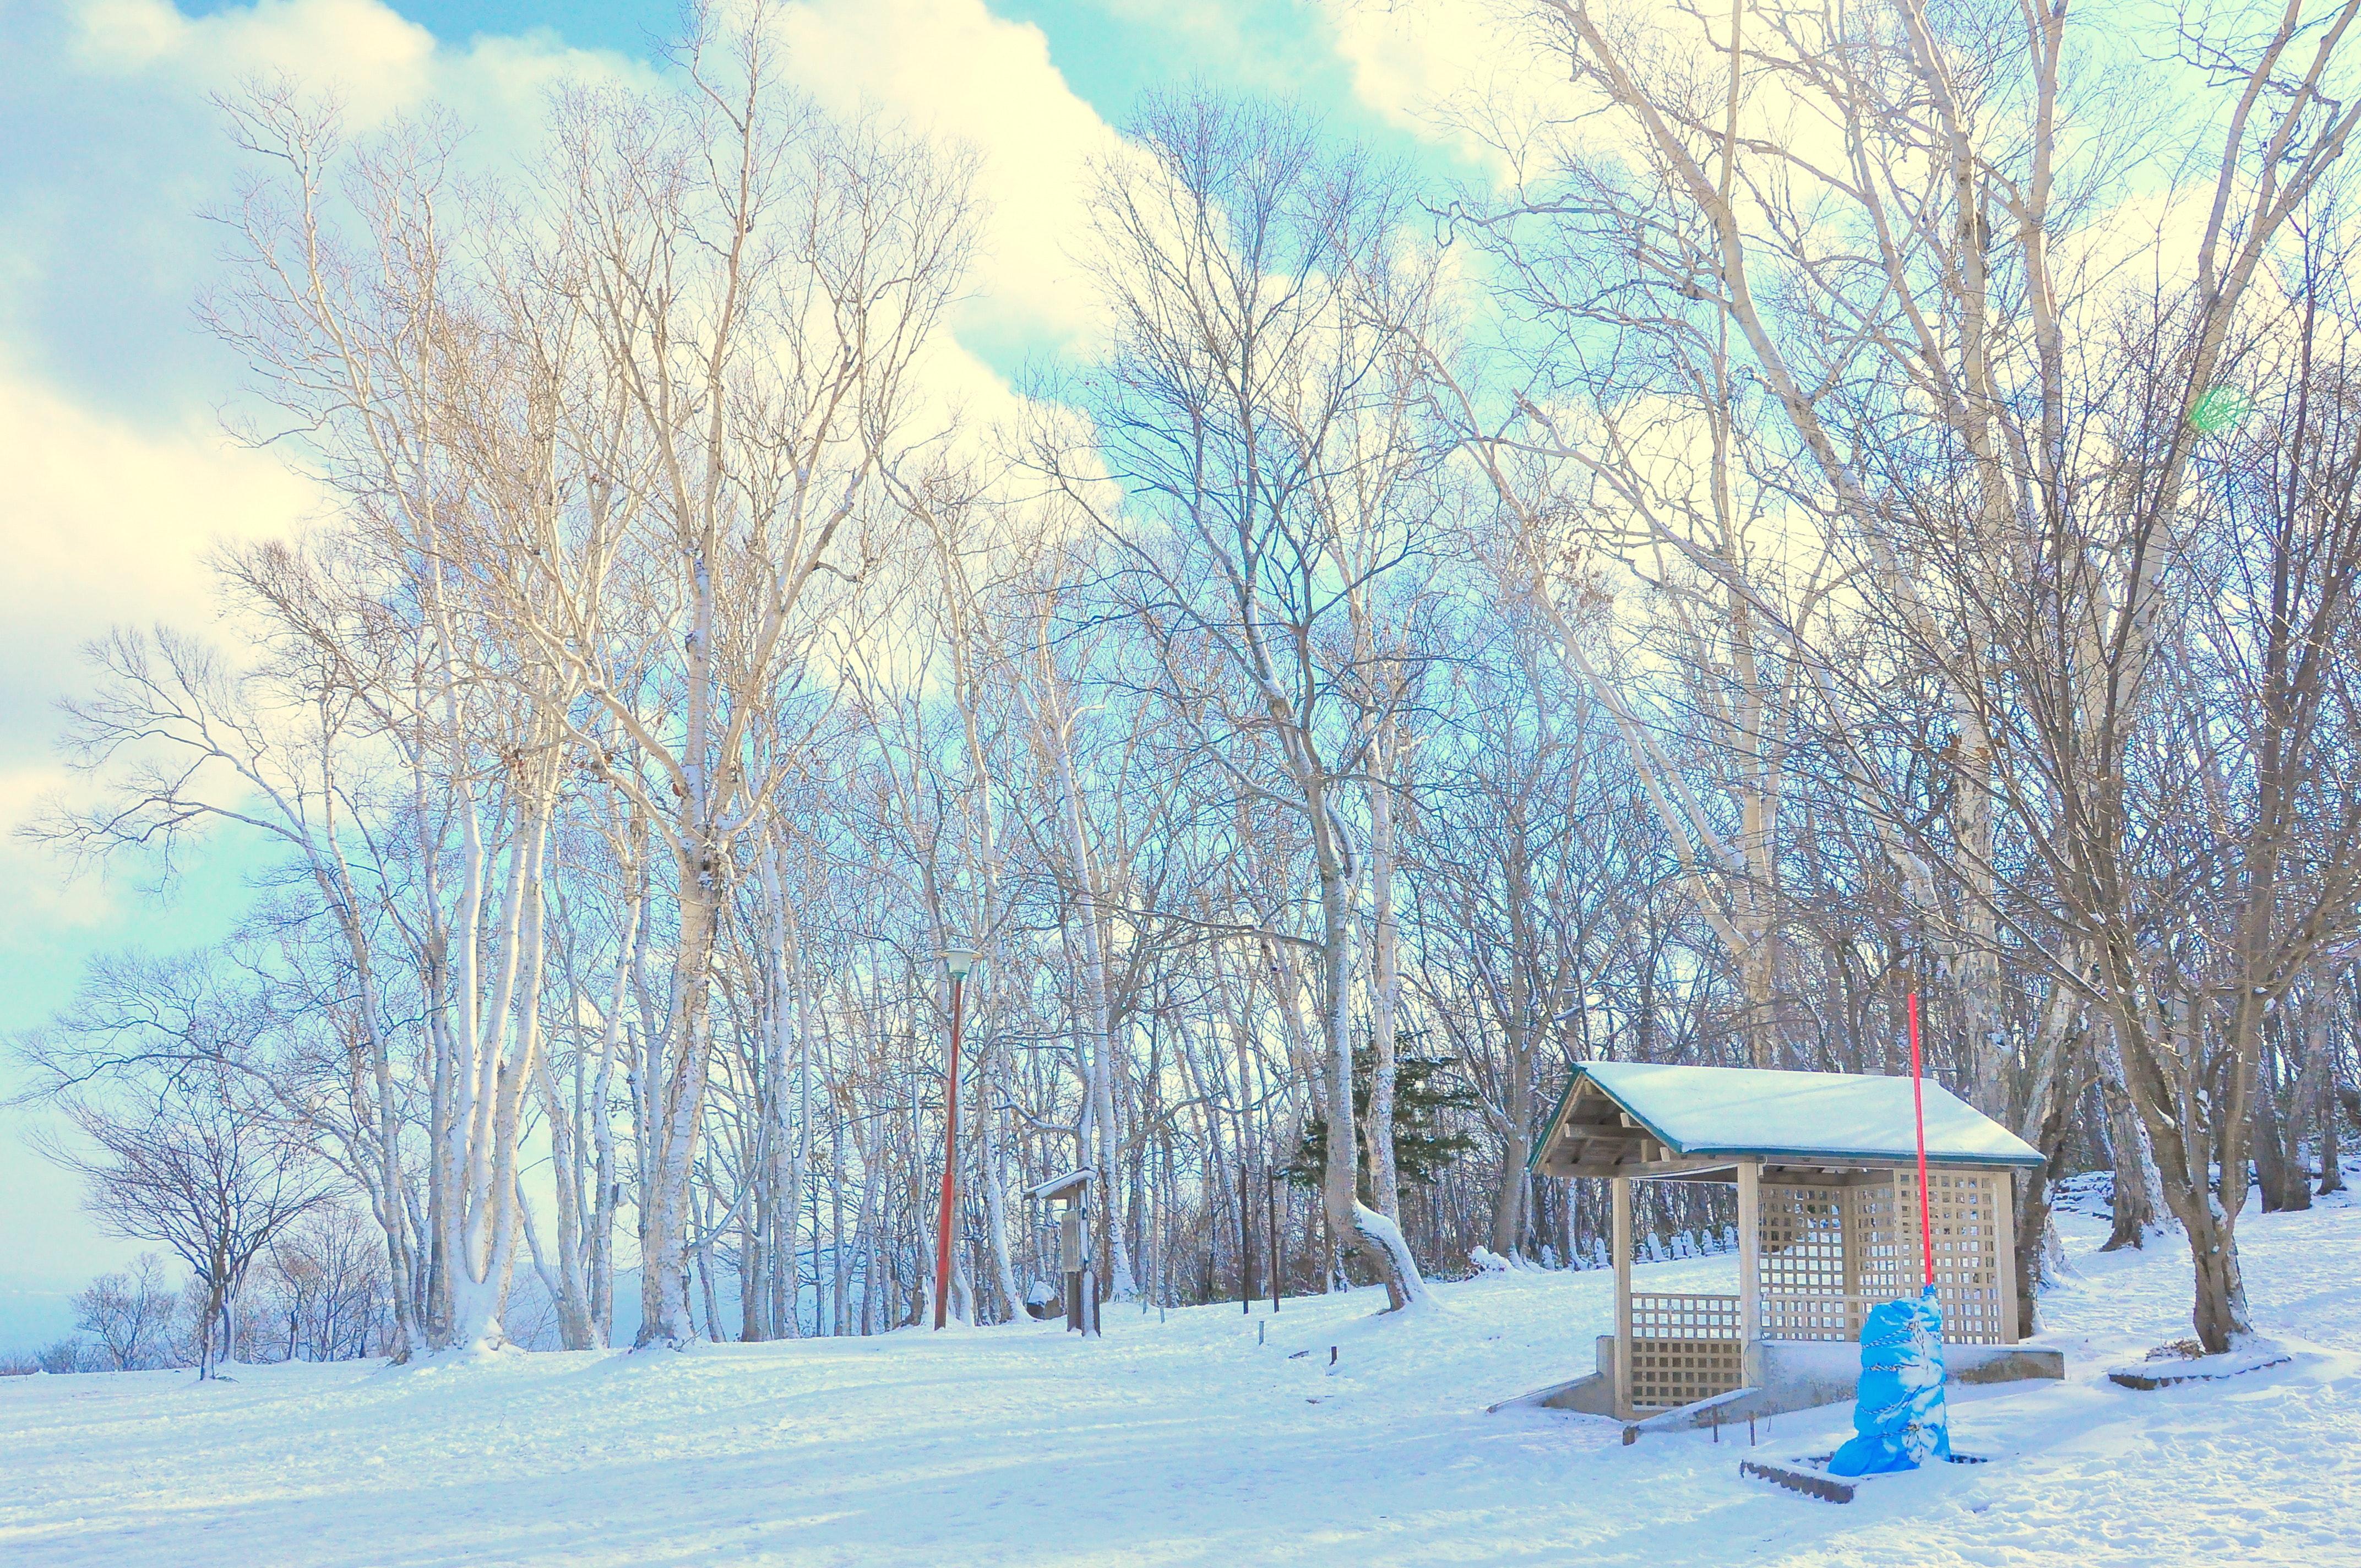 Snow field near in forest photo